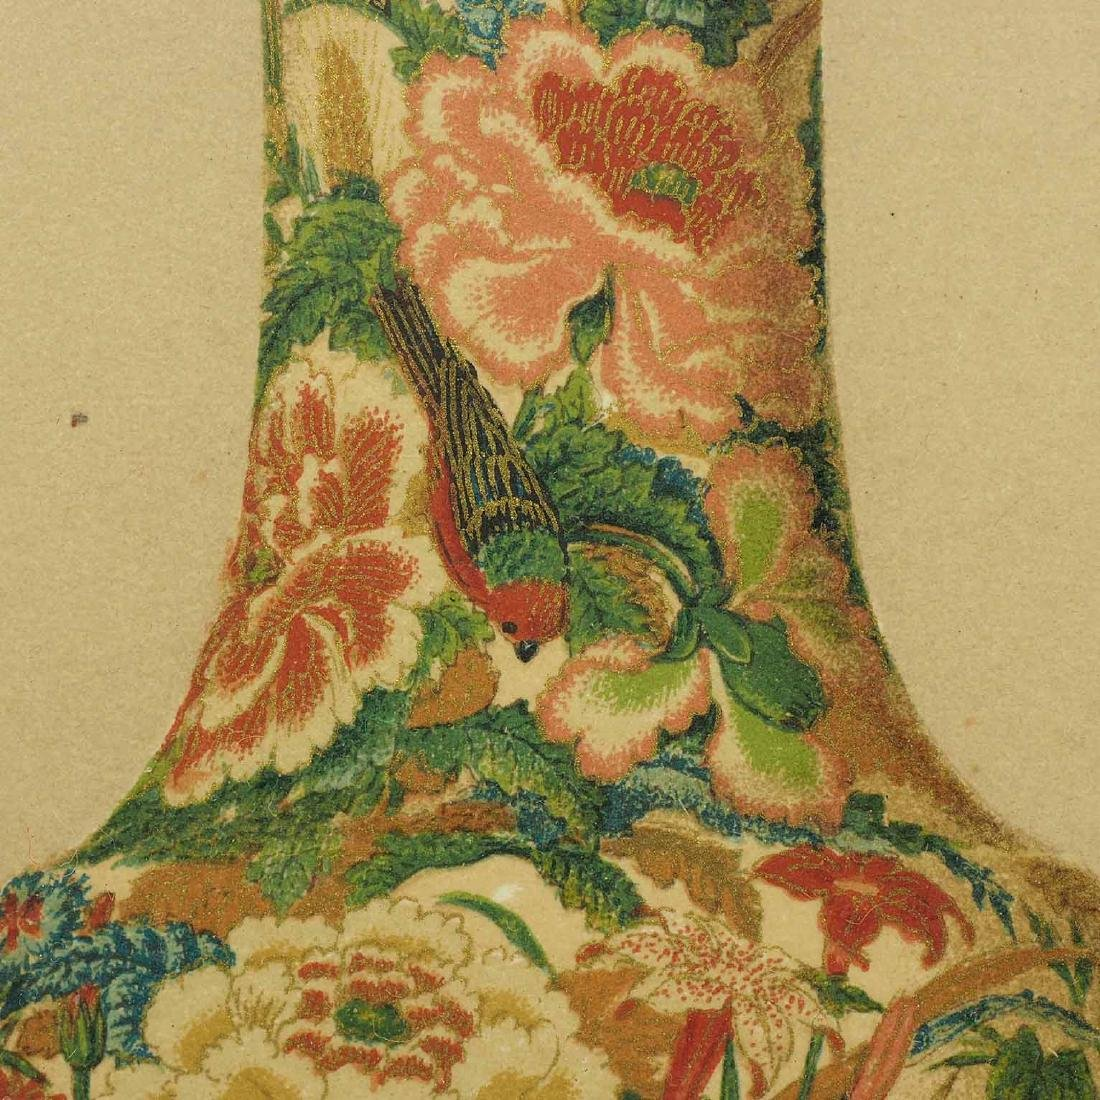 Satsouma, Ceramic Art of Japan, Lithograph by Firmin - 5